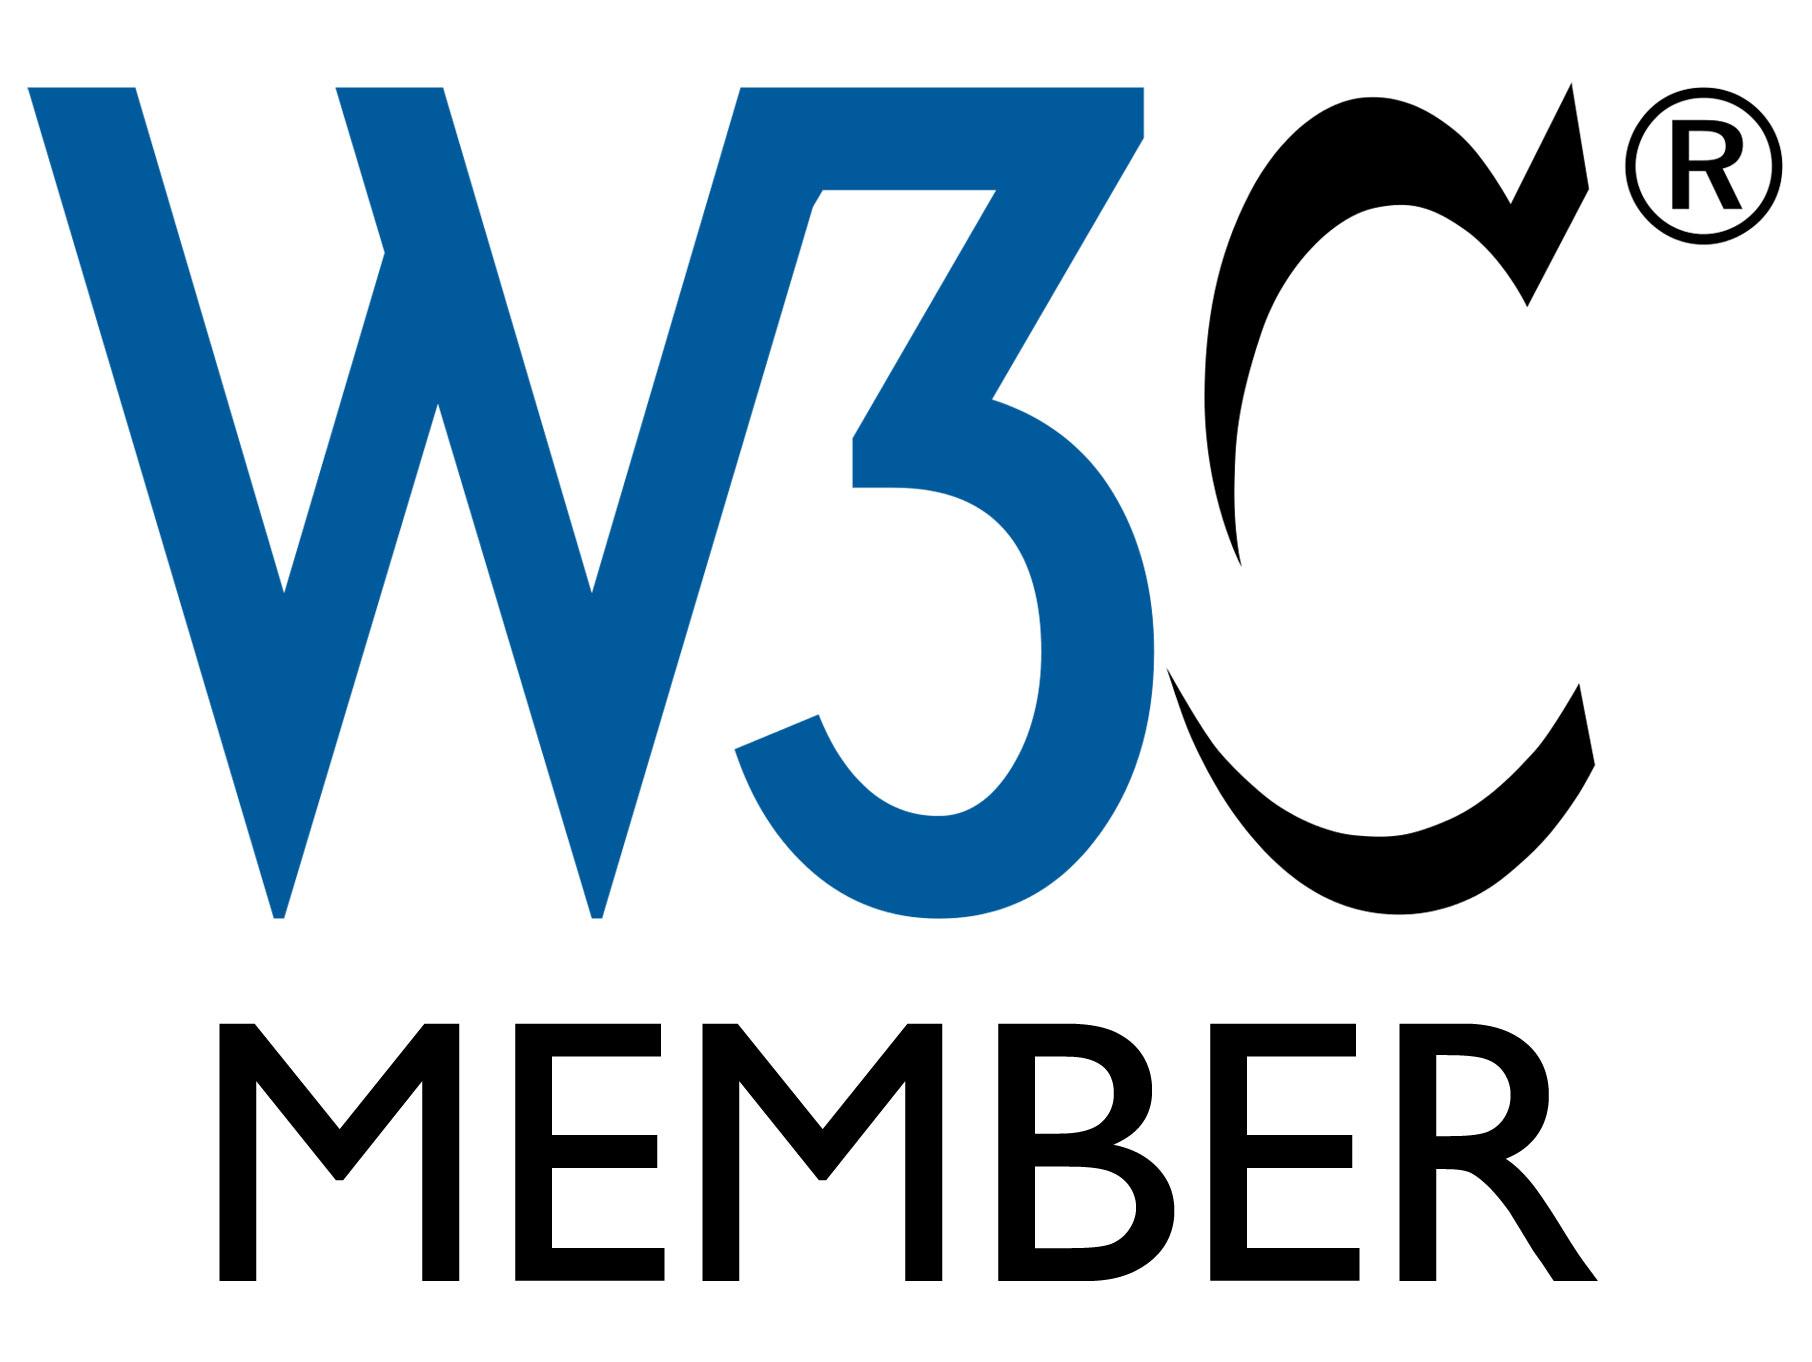 WebRTC expertise